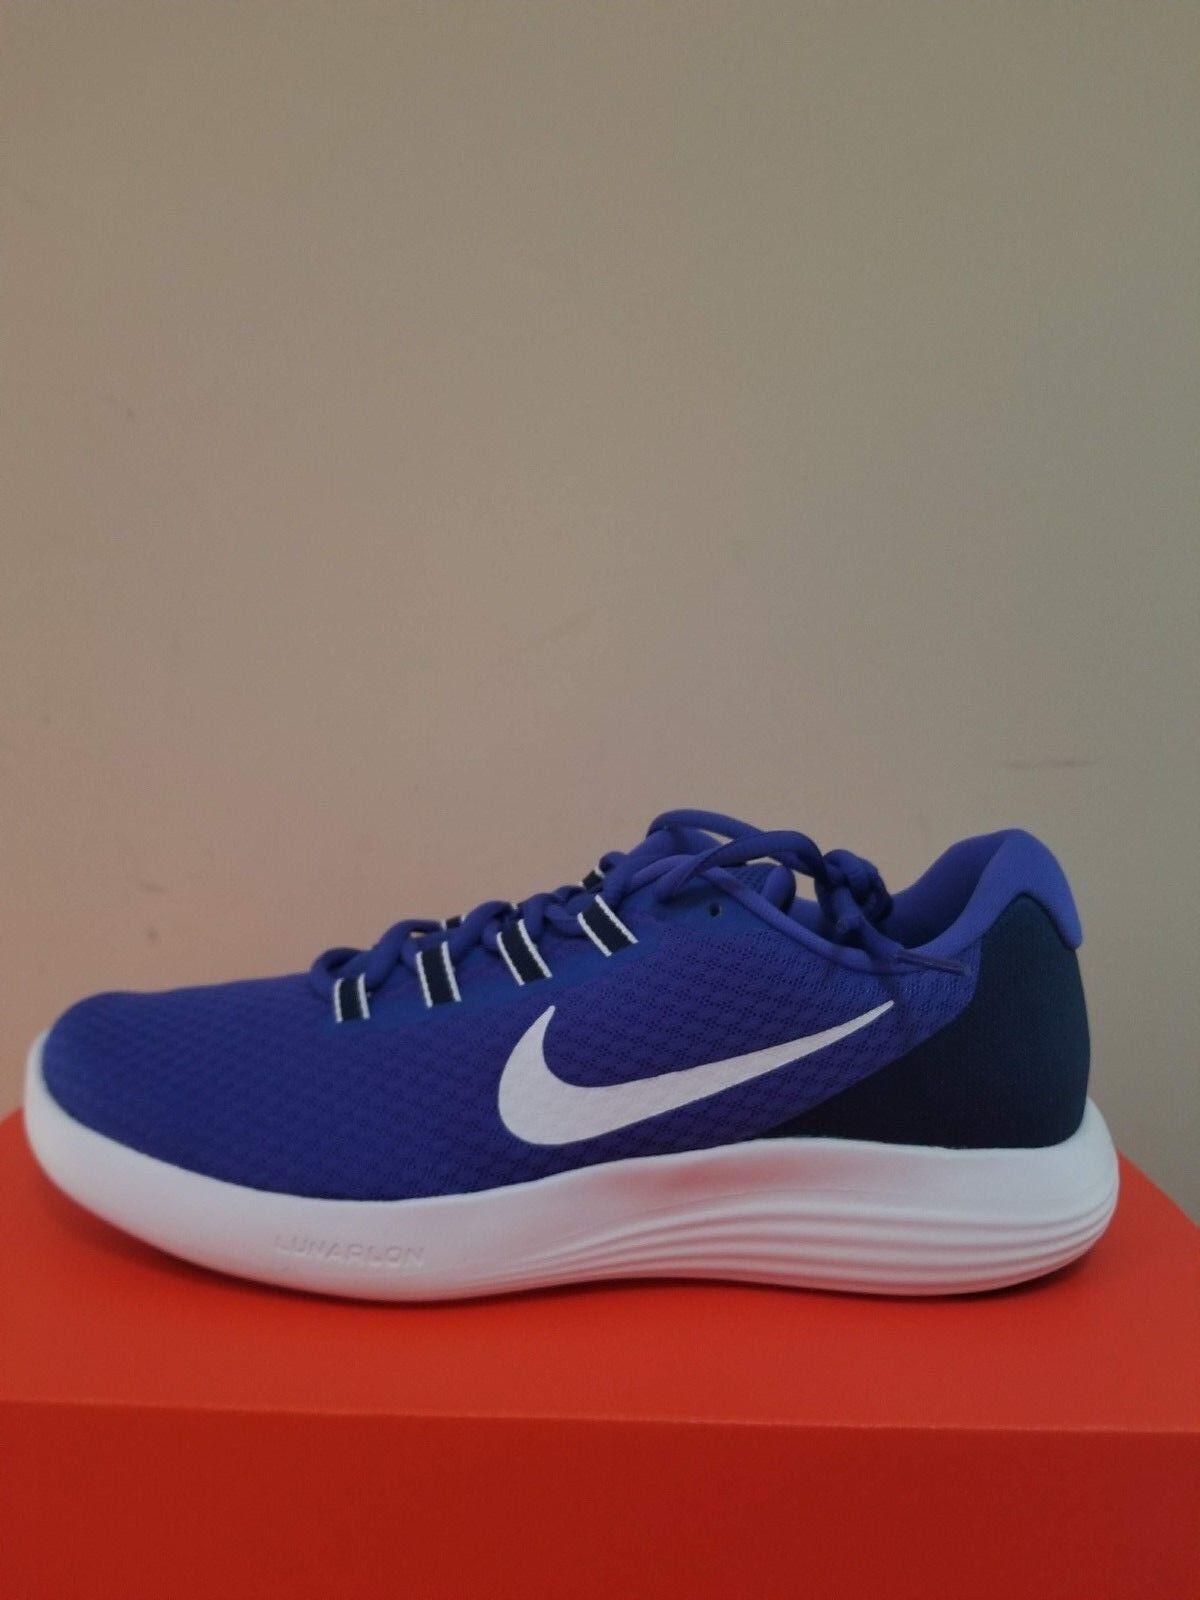 New Nike Men's Lunar Converge Running shoes Size 11 NIB